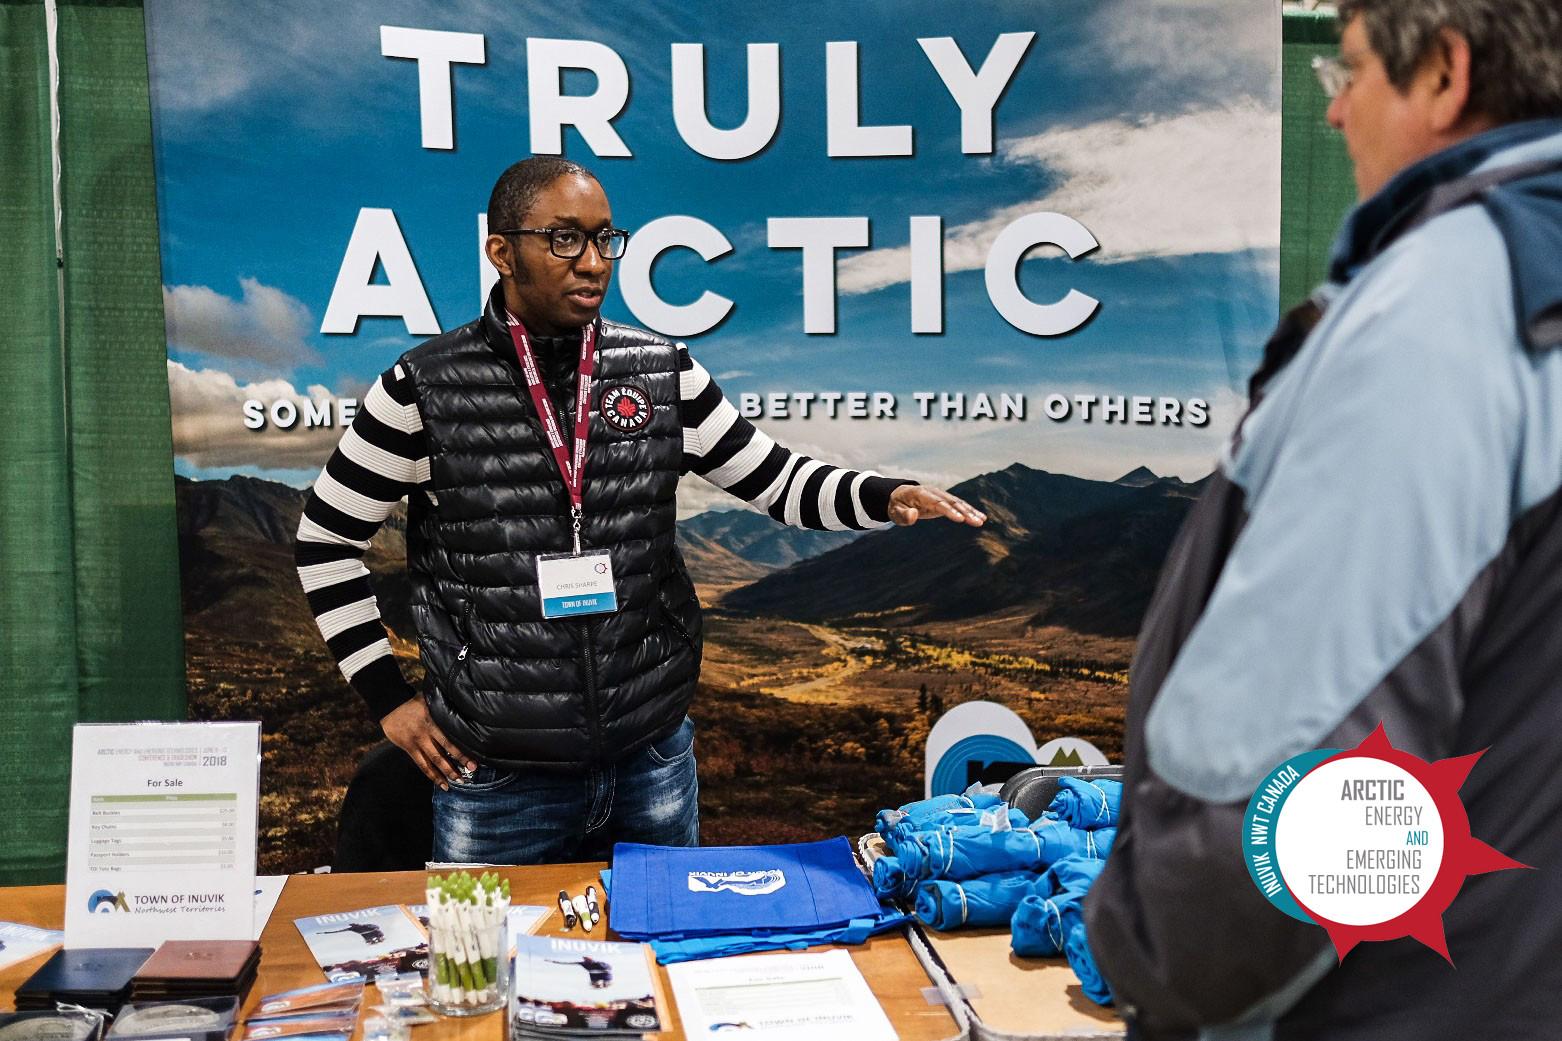 Truly Arctic Tradeshow